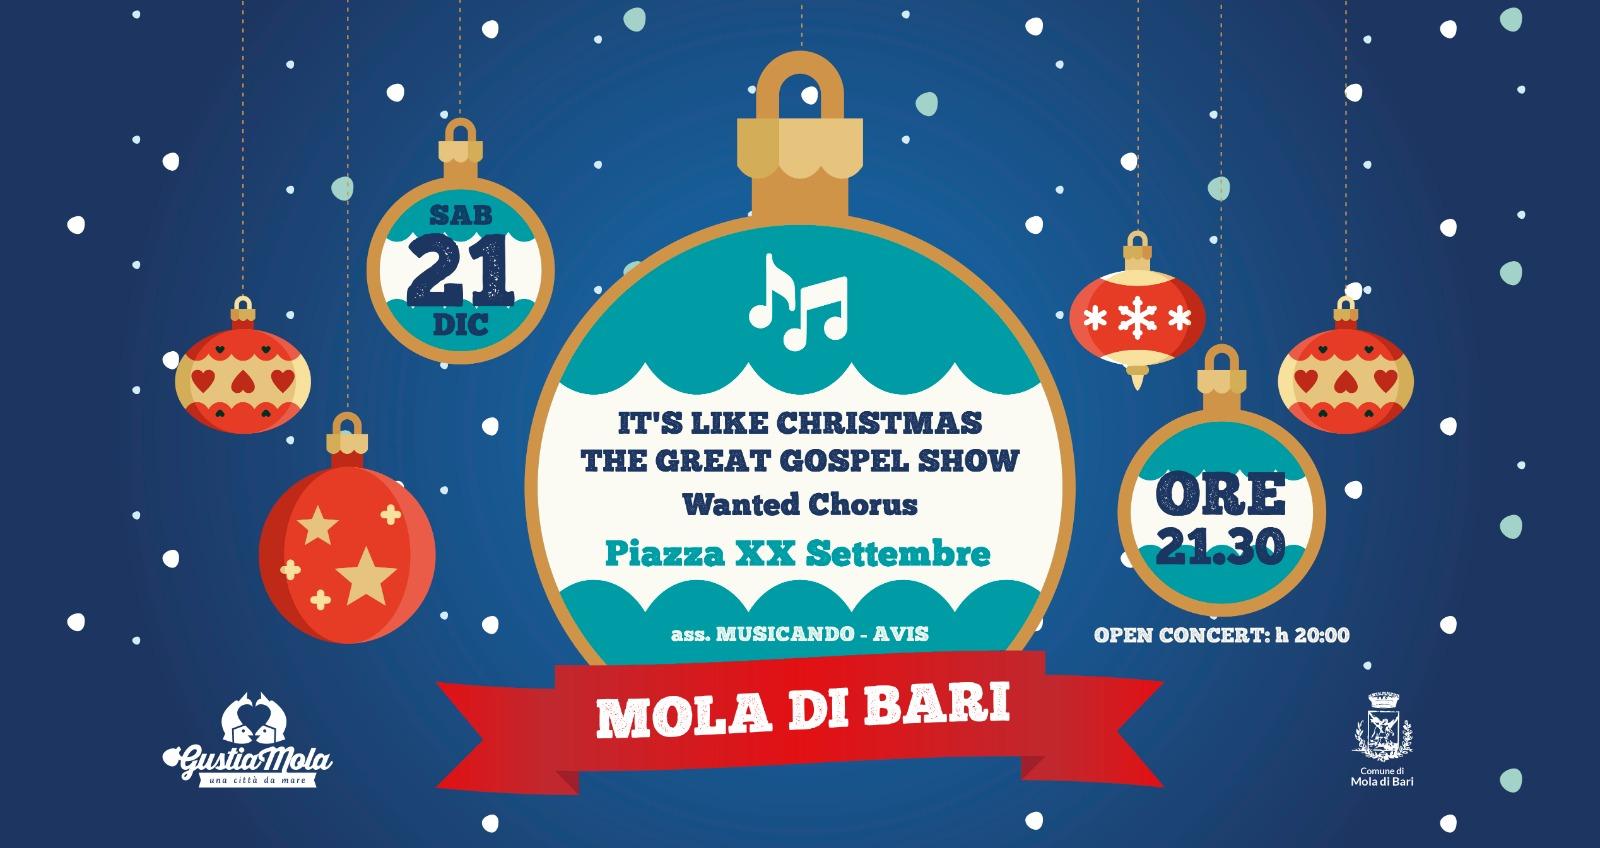 The great gospel show 21 dicembre gustiamola